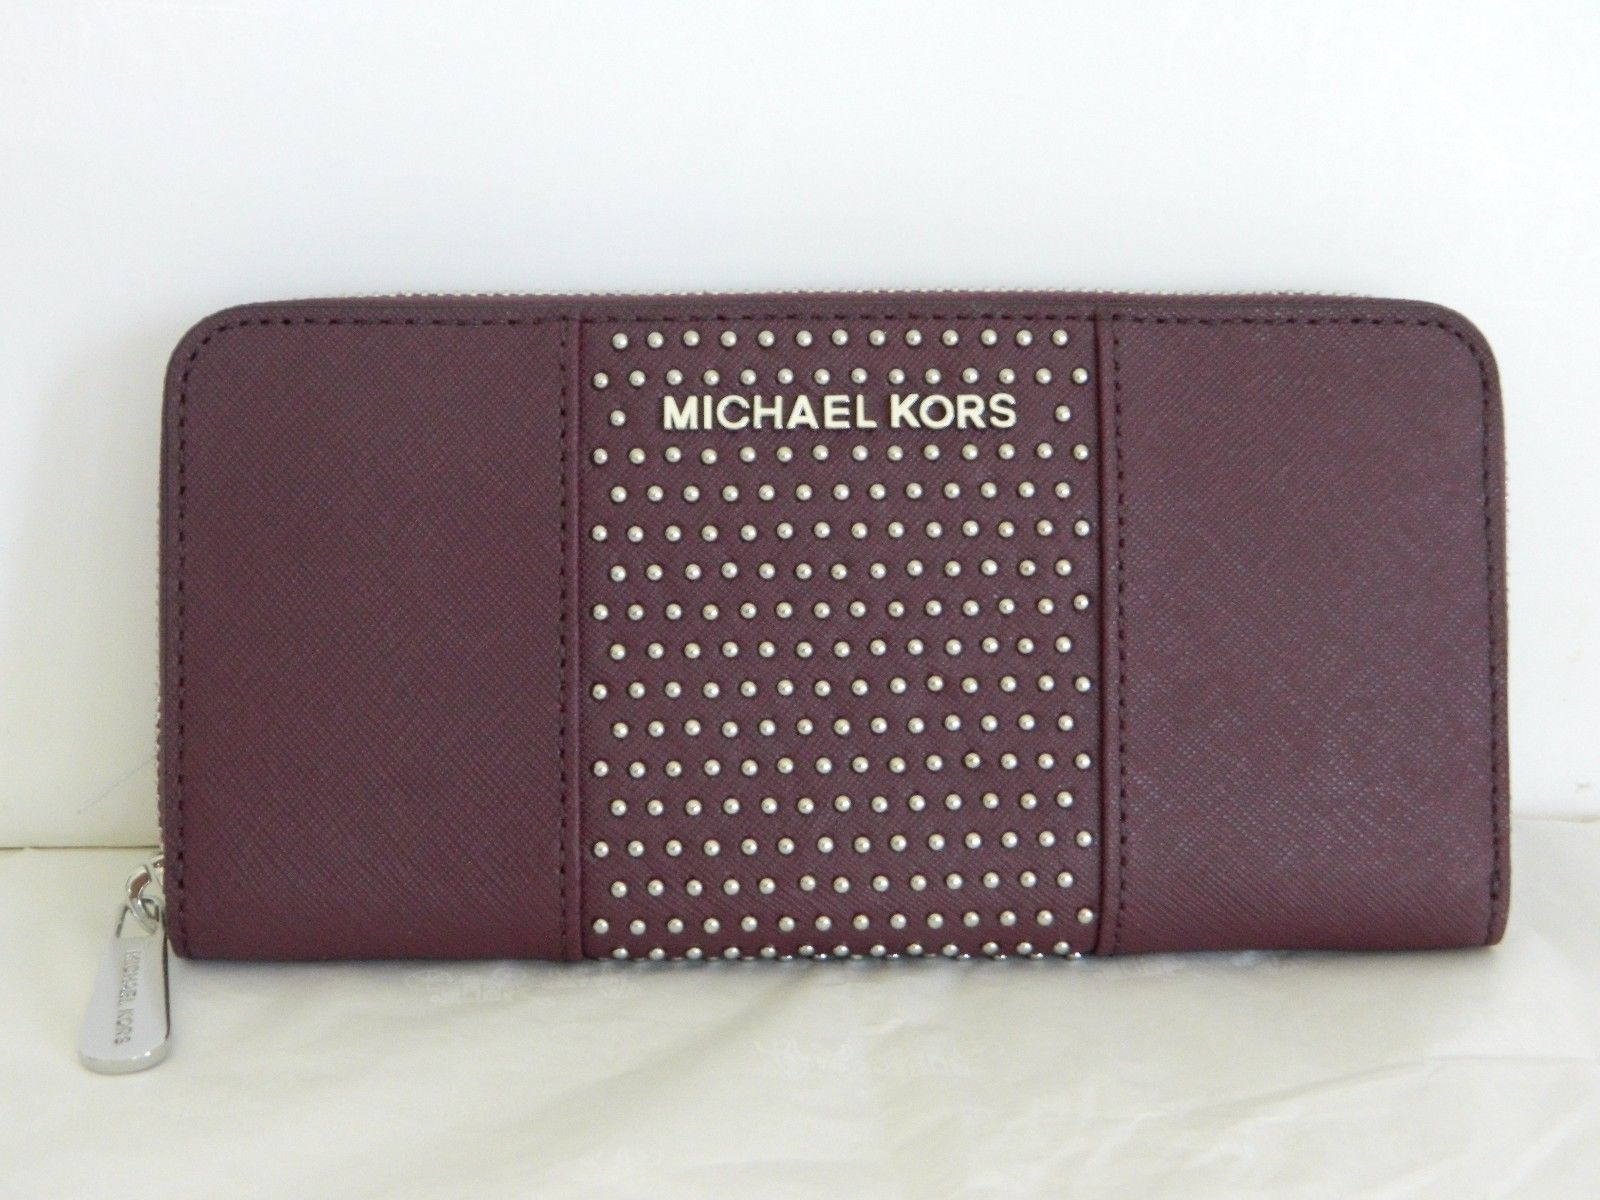 MICHAEL Michael Kors - MICHAEL KORS JSTVL PLUM MICRO STUD LTH ZA CONTINENTAL WALLET - Walmart.com